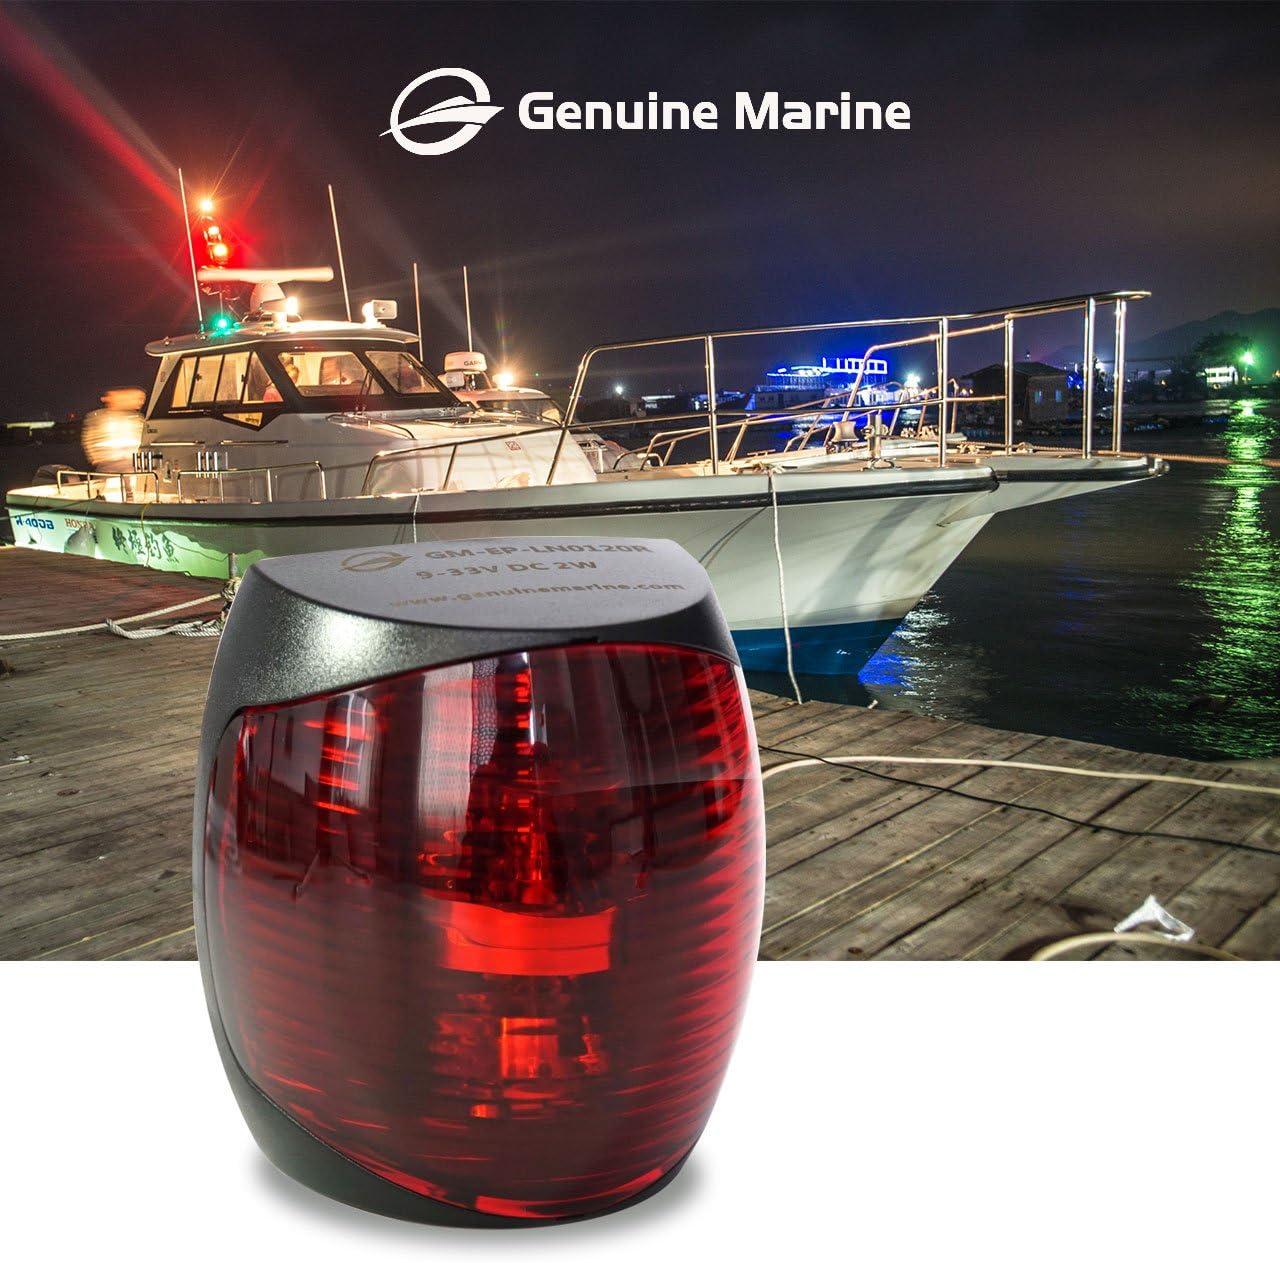 12V Marine Red Port Green Starboard Light Stern 3 NM Bi-Color Lights Operates at IP55// IP67 THALASSA Boat 12V Navigation Lights Water Resistant Lamp Safe Sailing as Signal Lamp